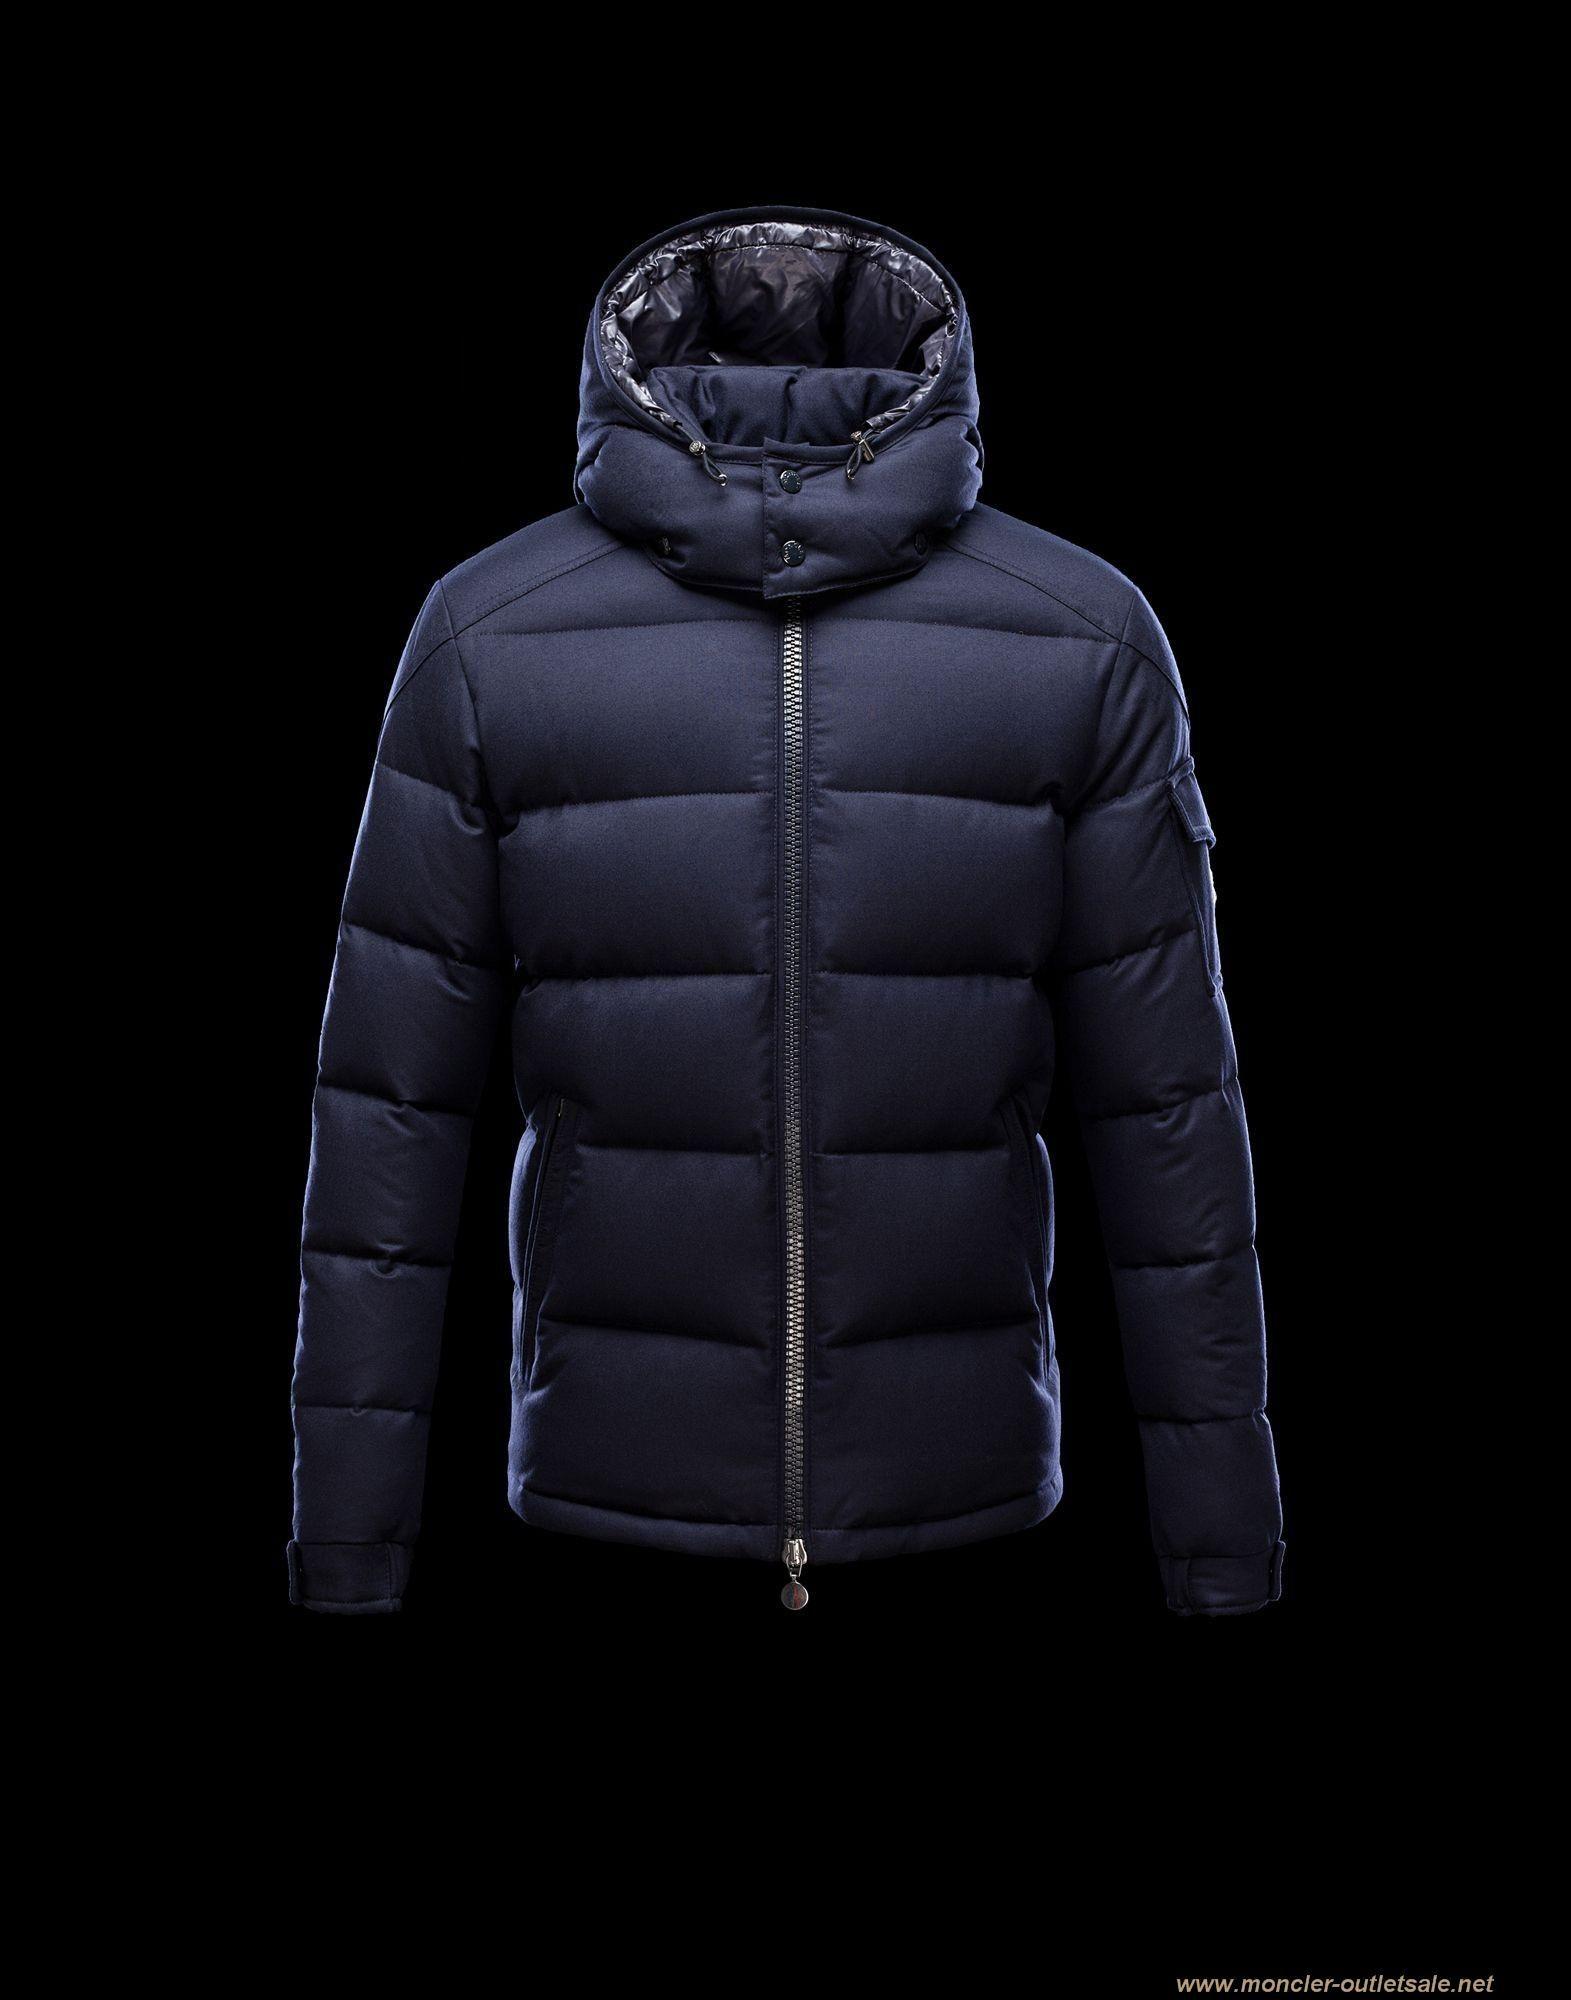 2013 New! Moncler Montgenevre Winter Jackets For Men Blue